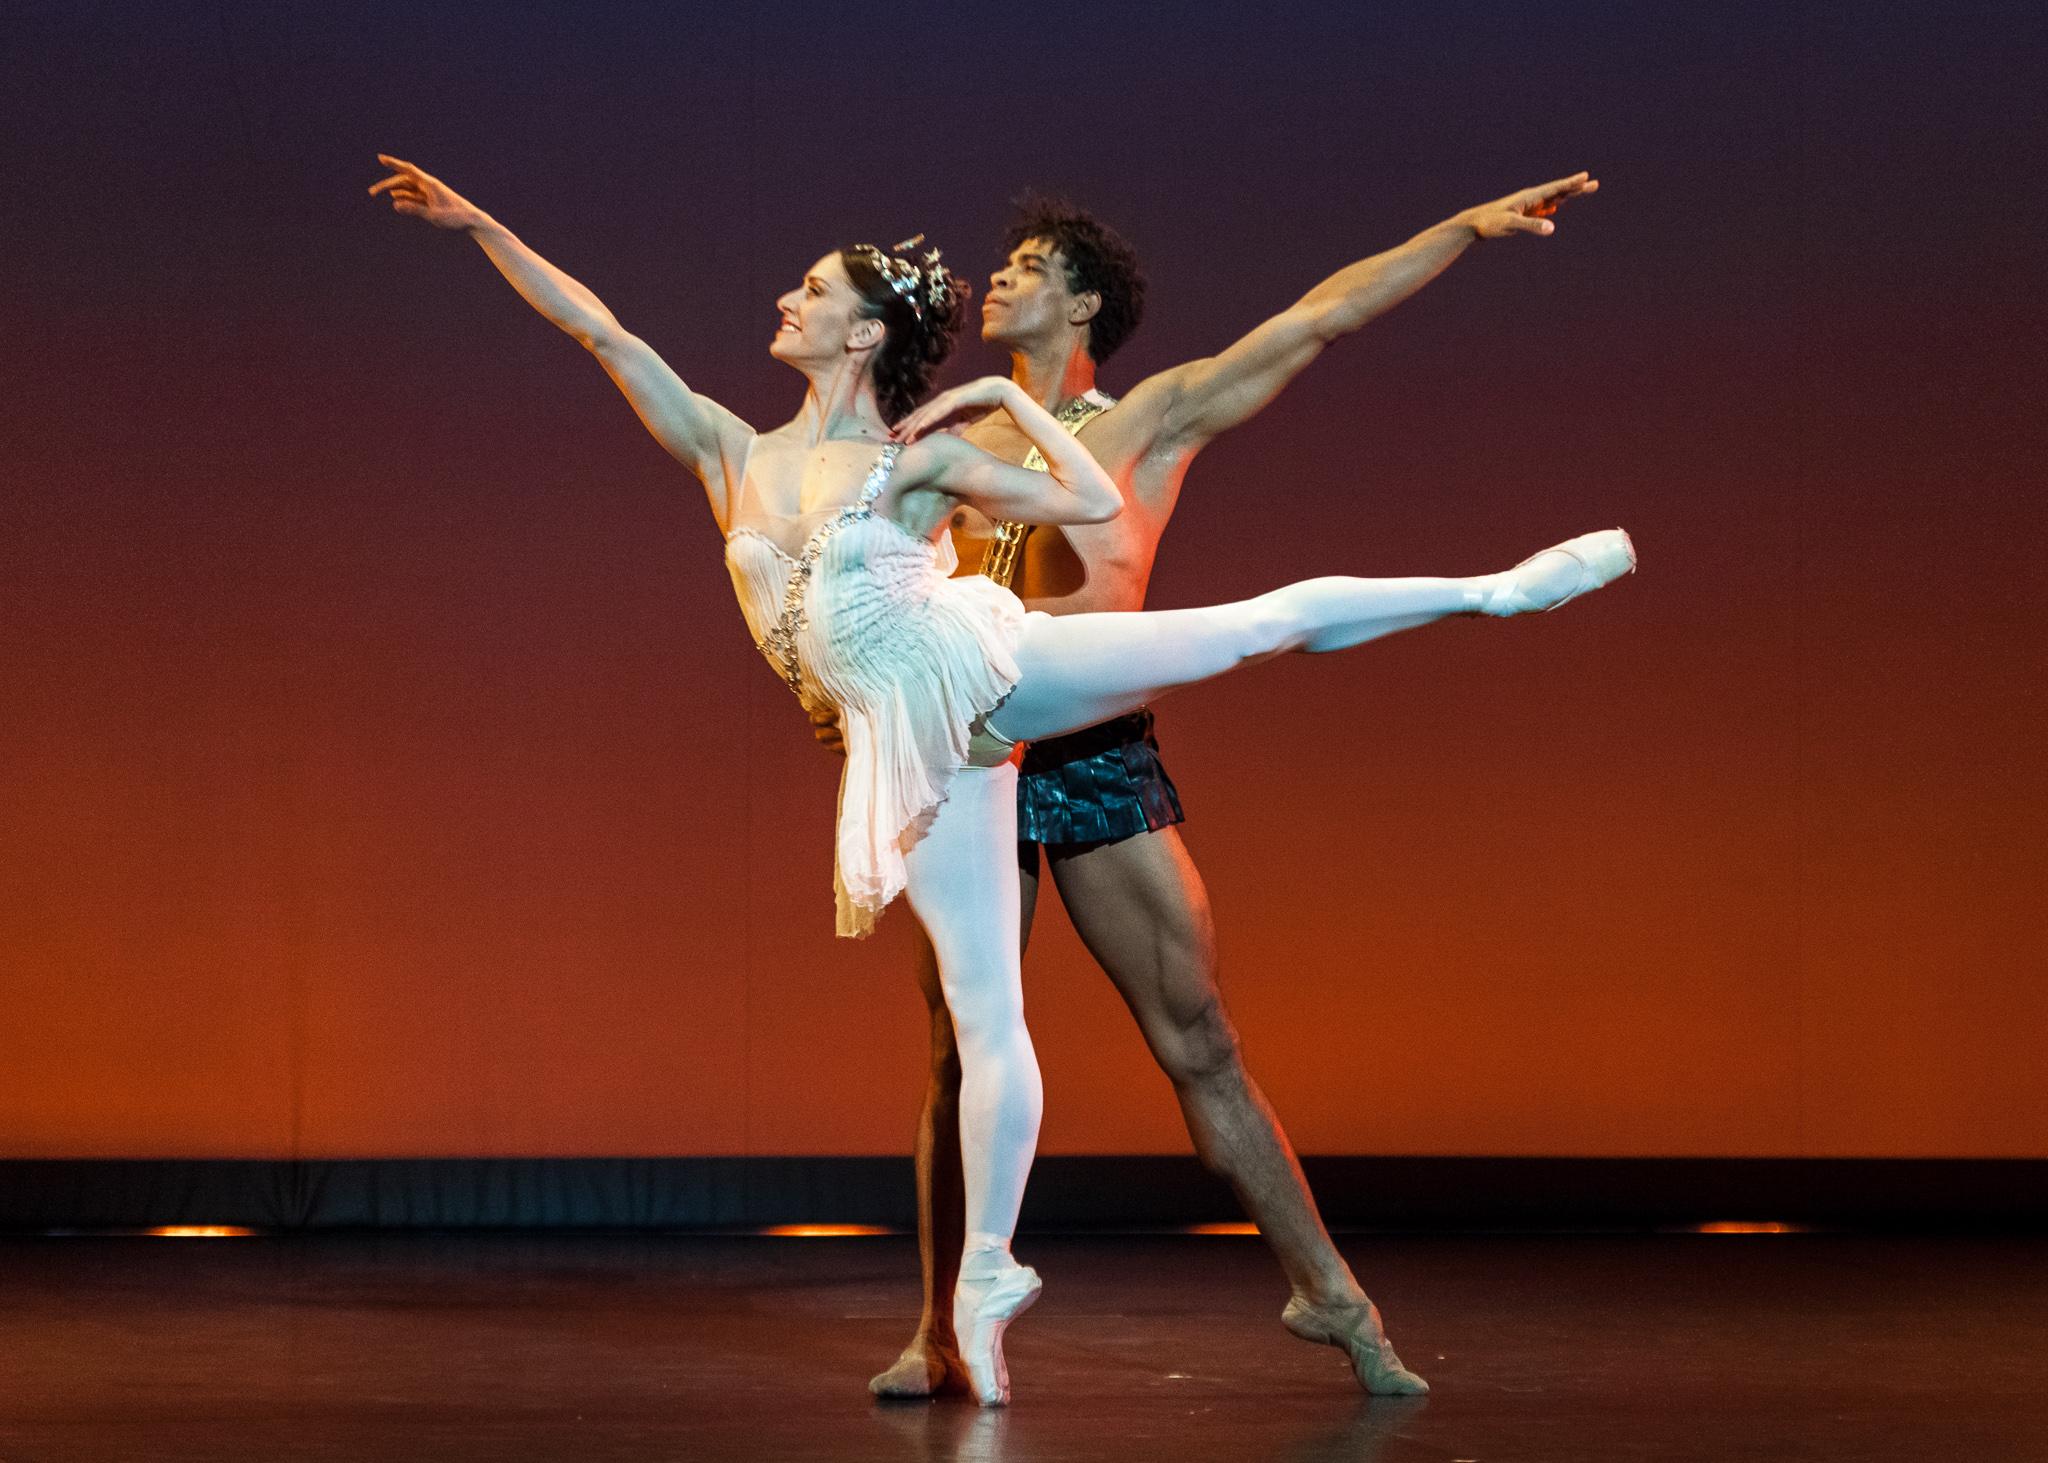 image of Carlos Acosta & Marianela Nuñez dance photography, fotografia de escena, fotografo de danza, dance photographer, stage photography, ballet photography